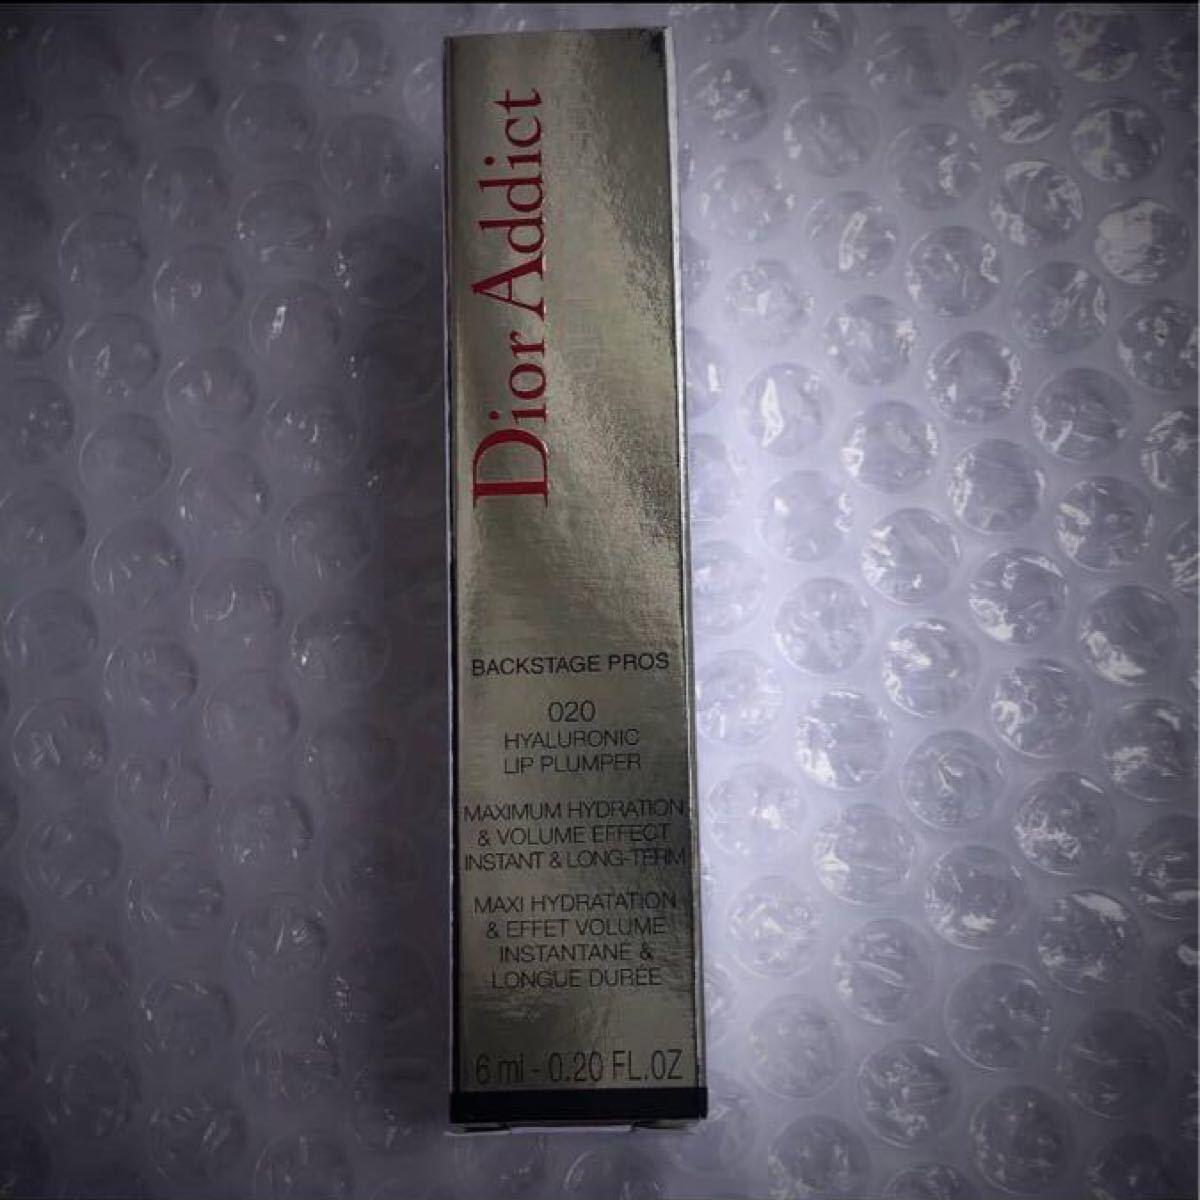 Dior ディオール クリスチャンディオール  アディクトリップ マキシマイザー 020 チョコレート ブラウン リップ 限定